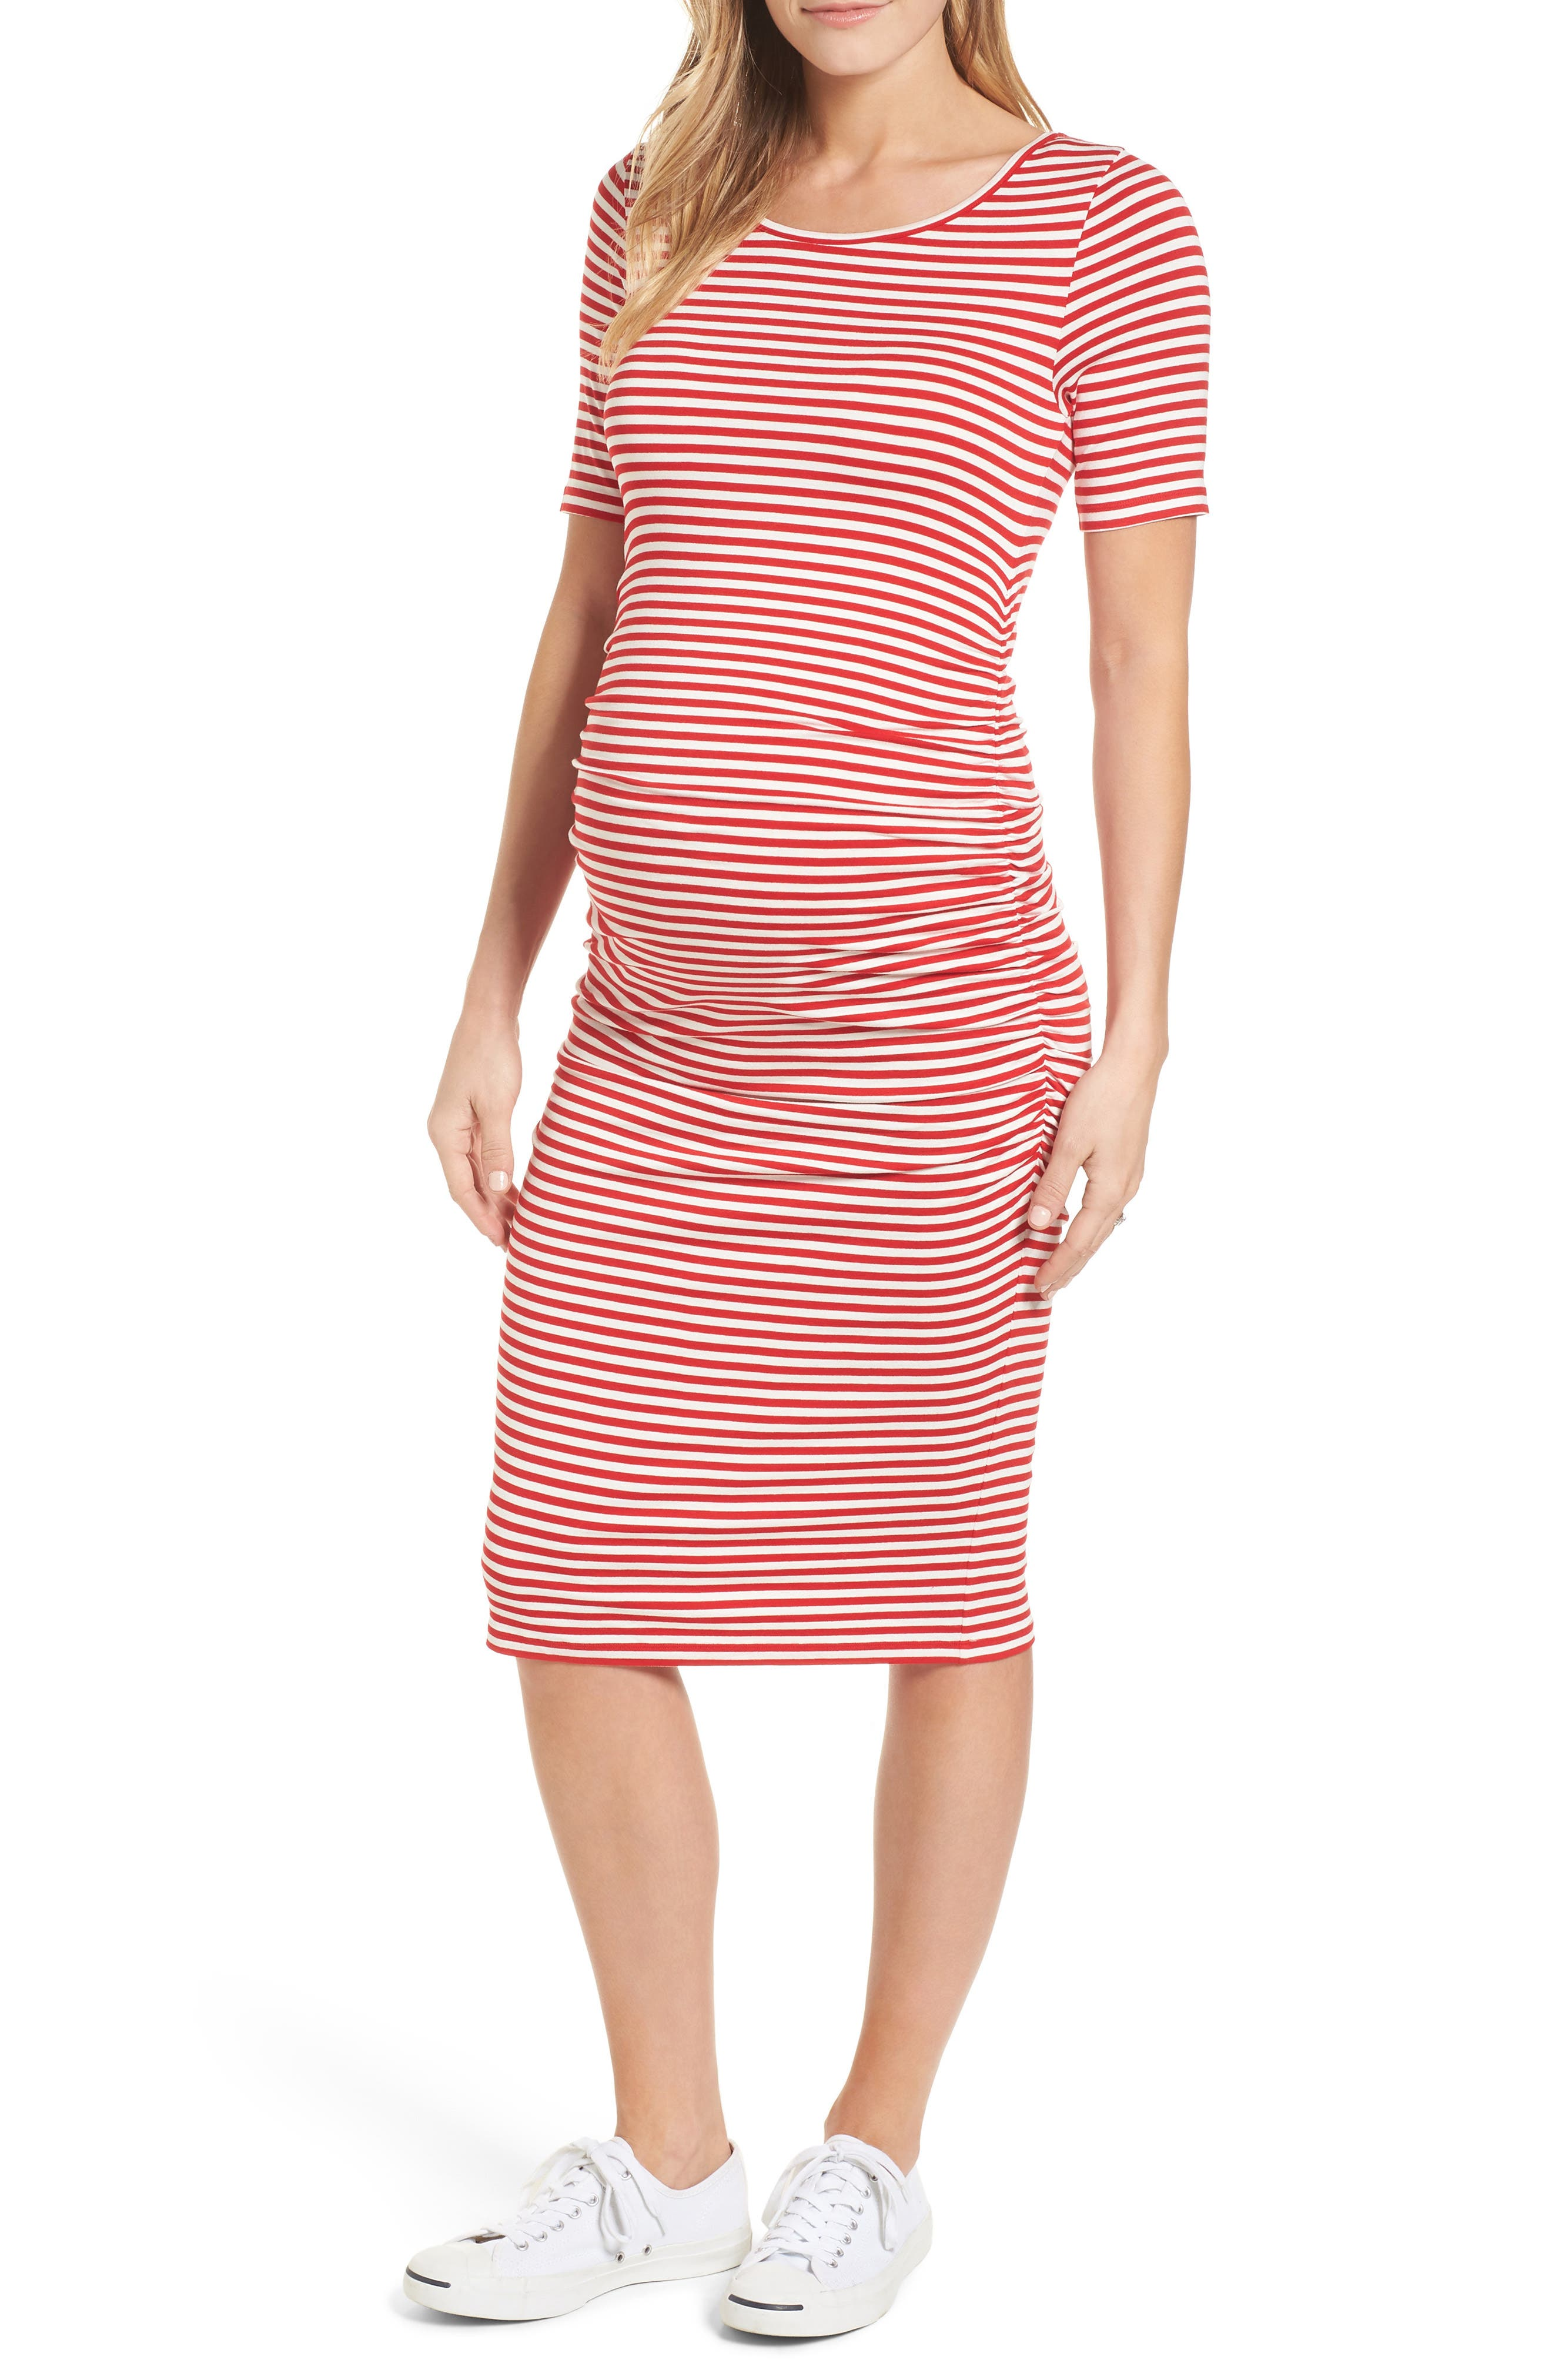 Isabella Oliver Jenna Stripe Maternity T-Shirt Dress